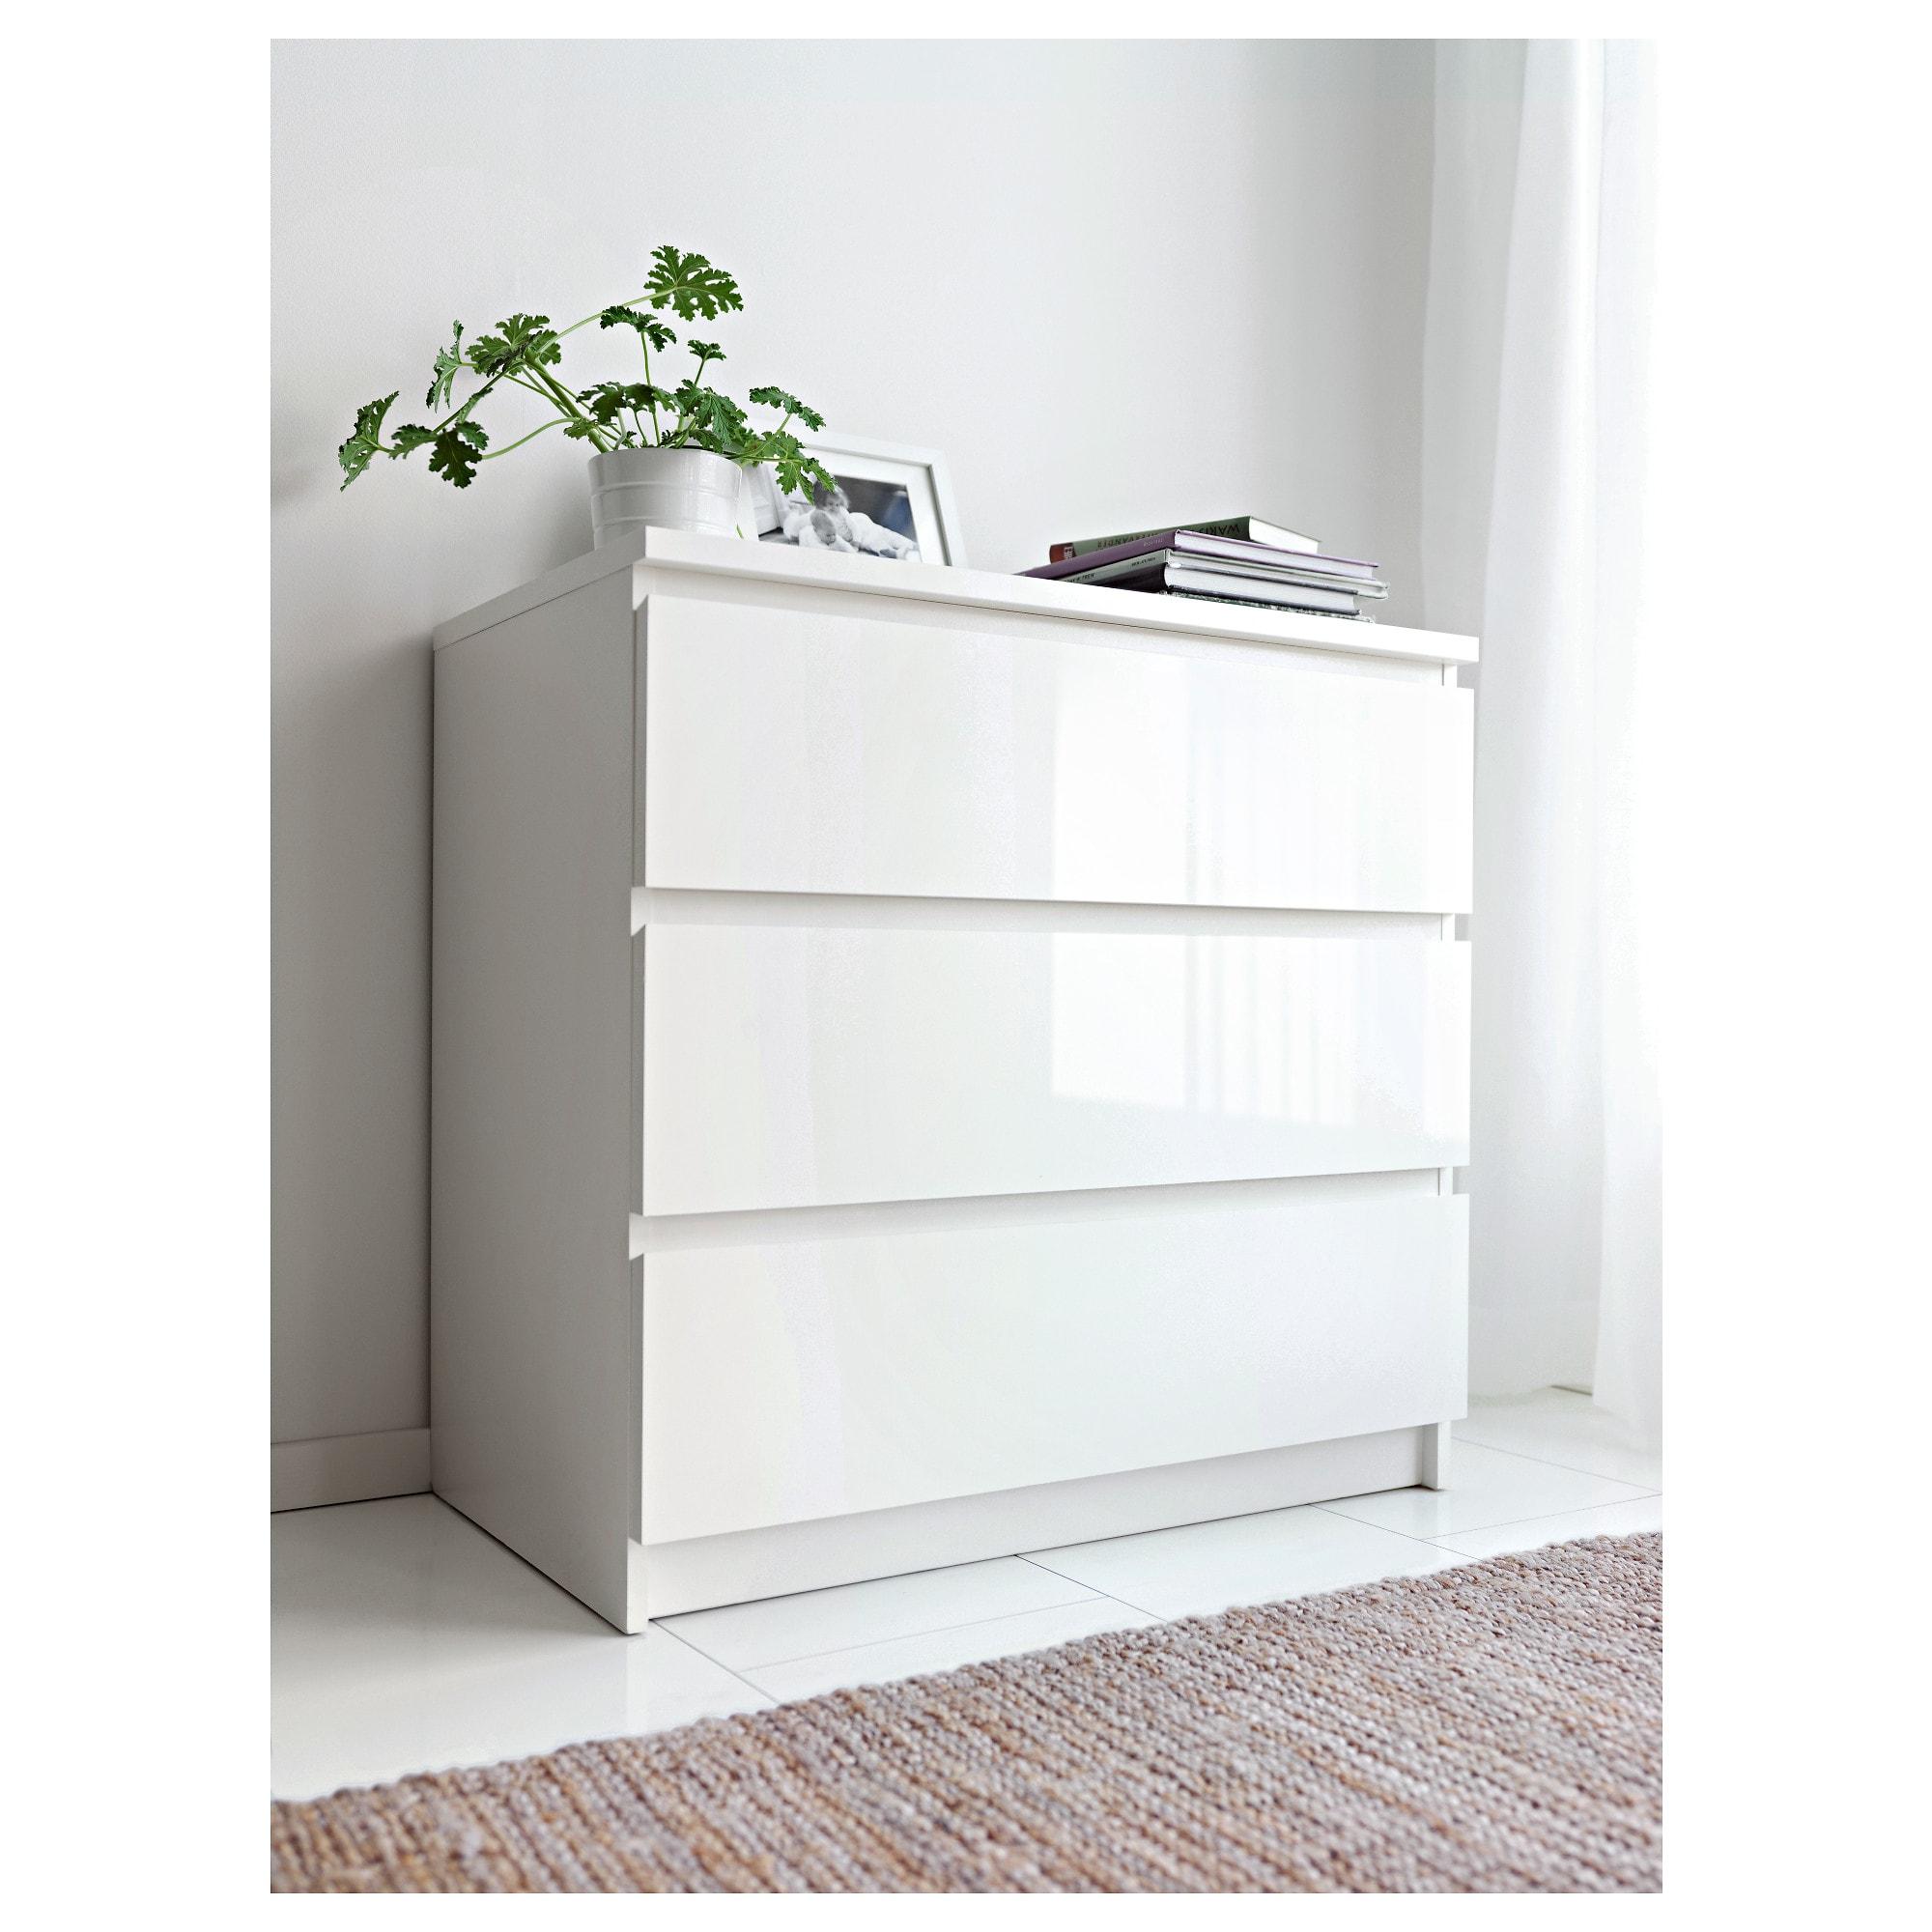 Image Result For Ikea Malm Malm Kommode Kommode Weiss Hochglanz